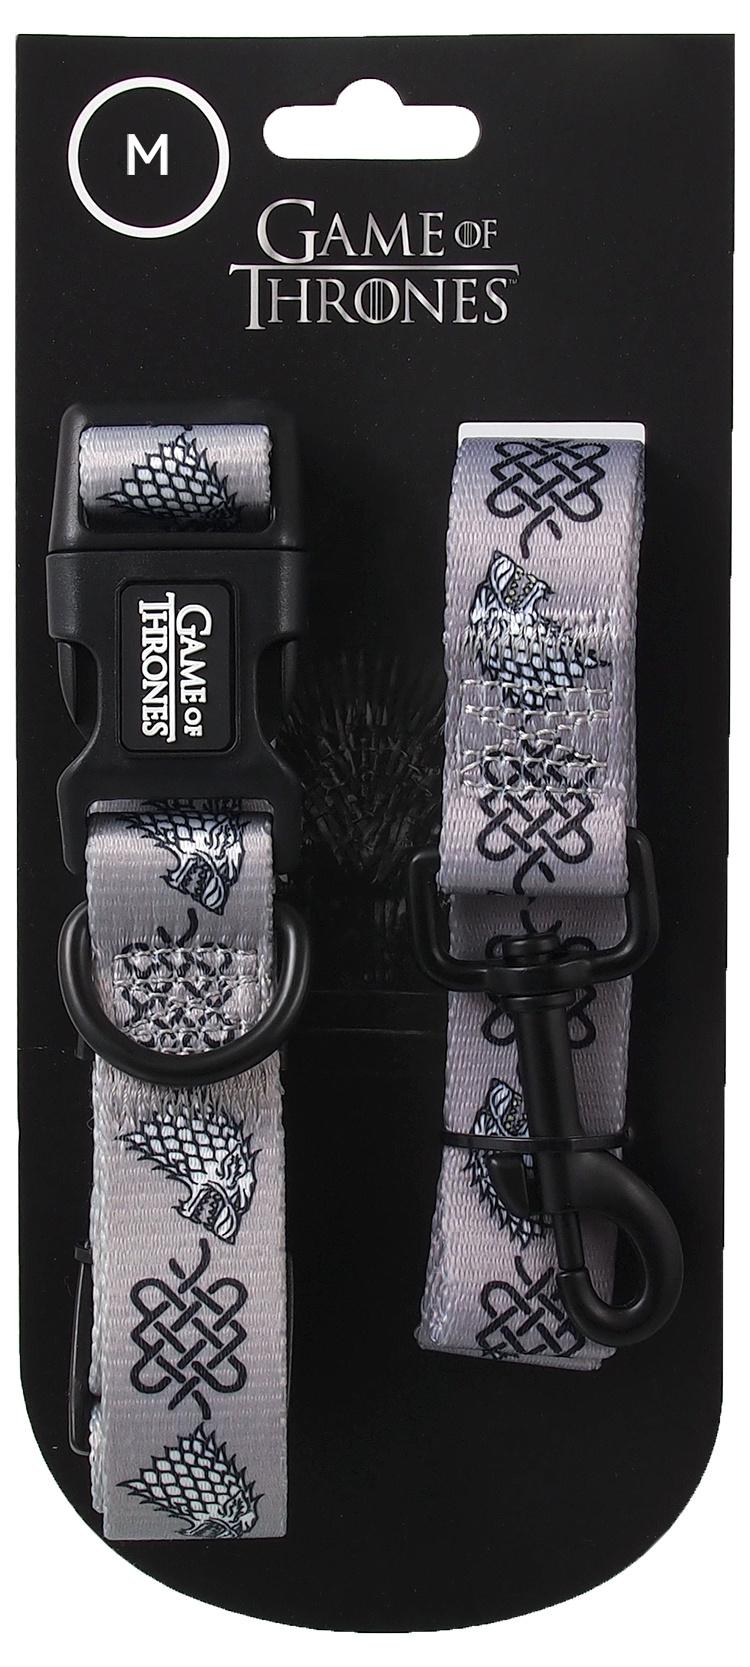 Поводок и ошейник - Game of Thrones Stark, silver, M